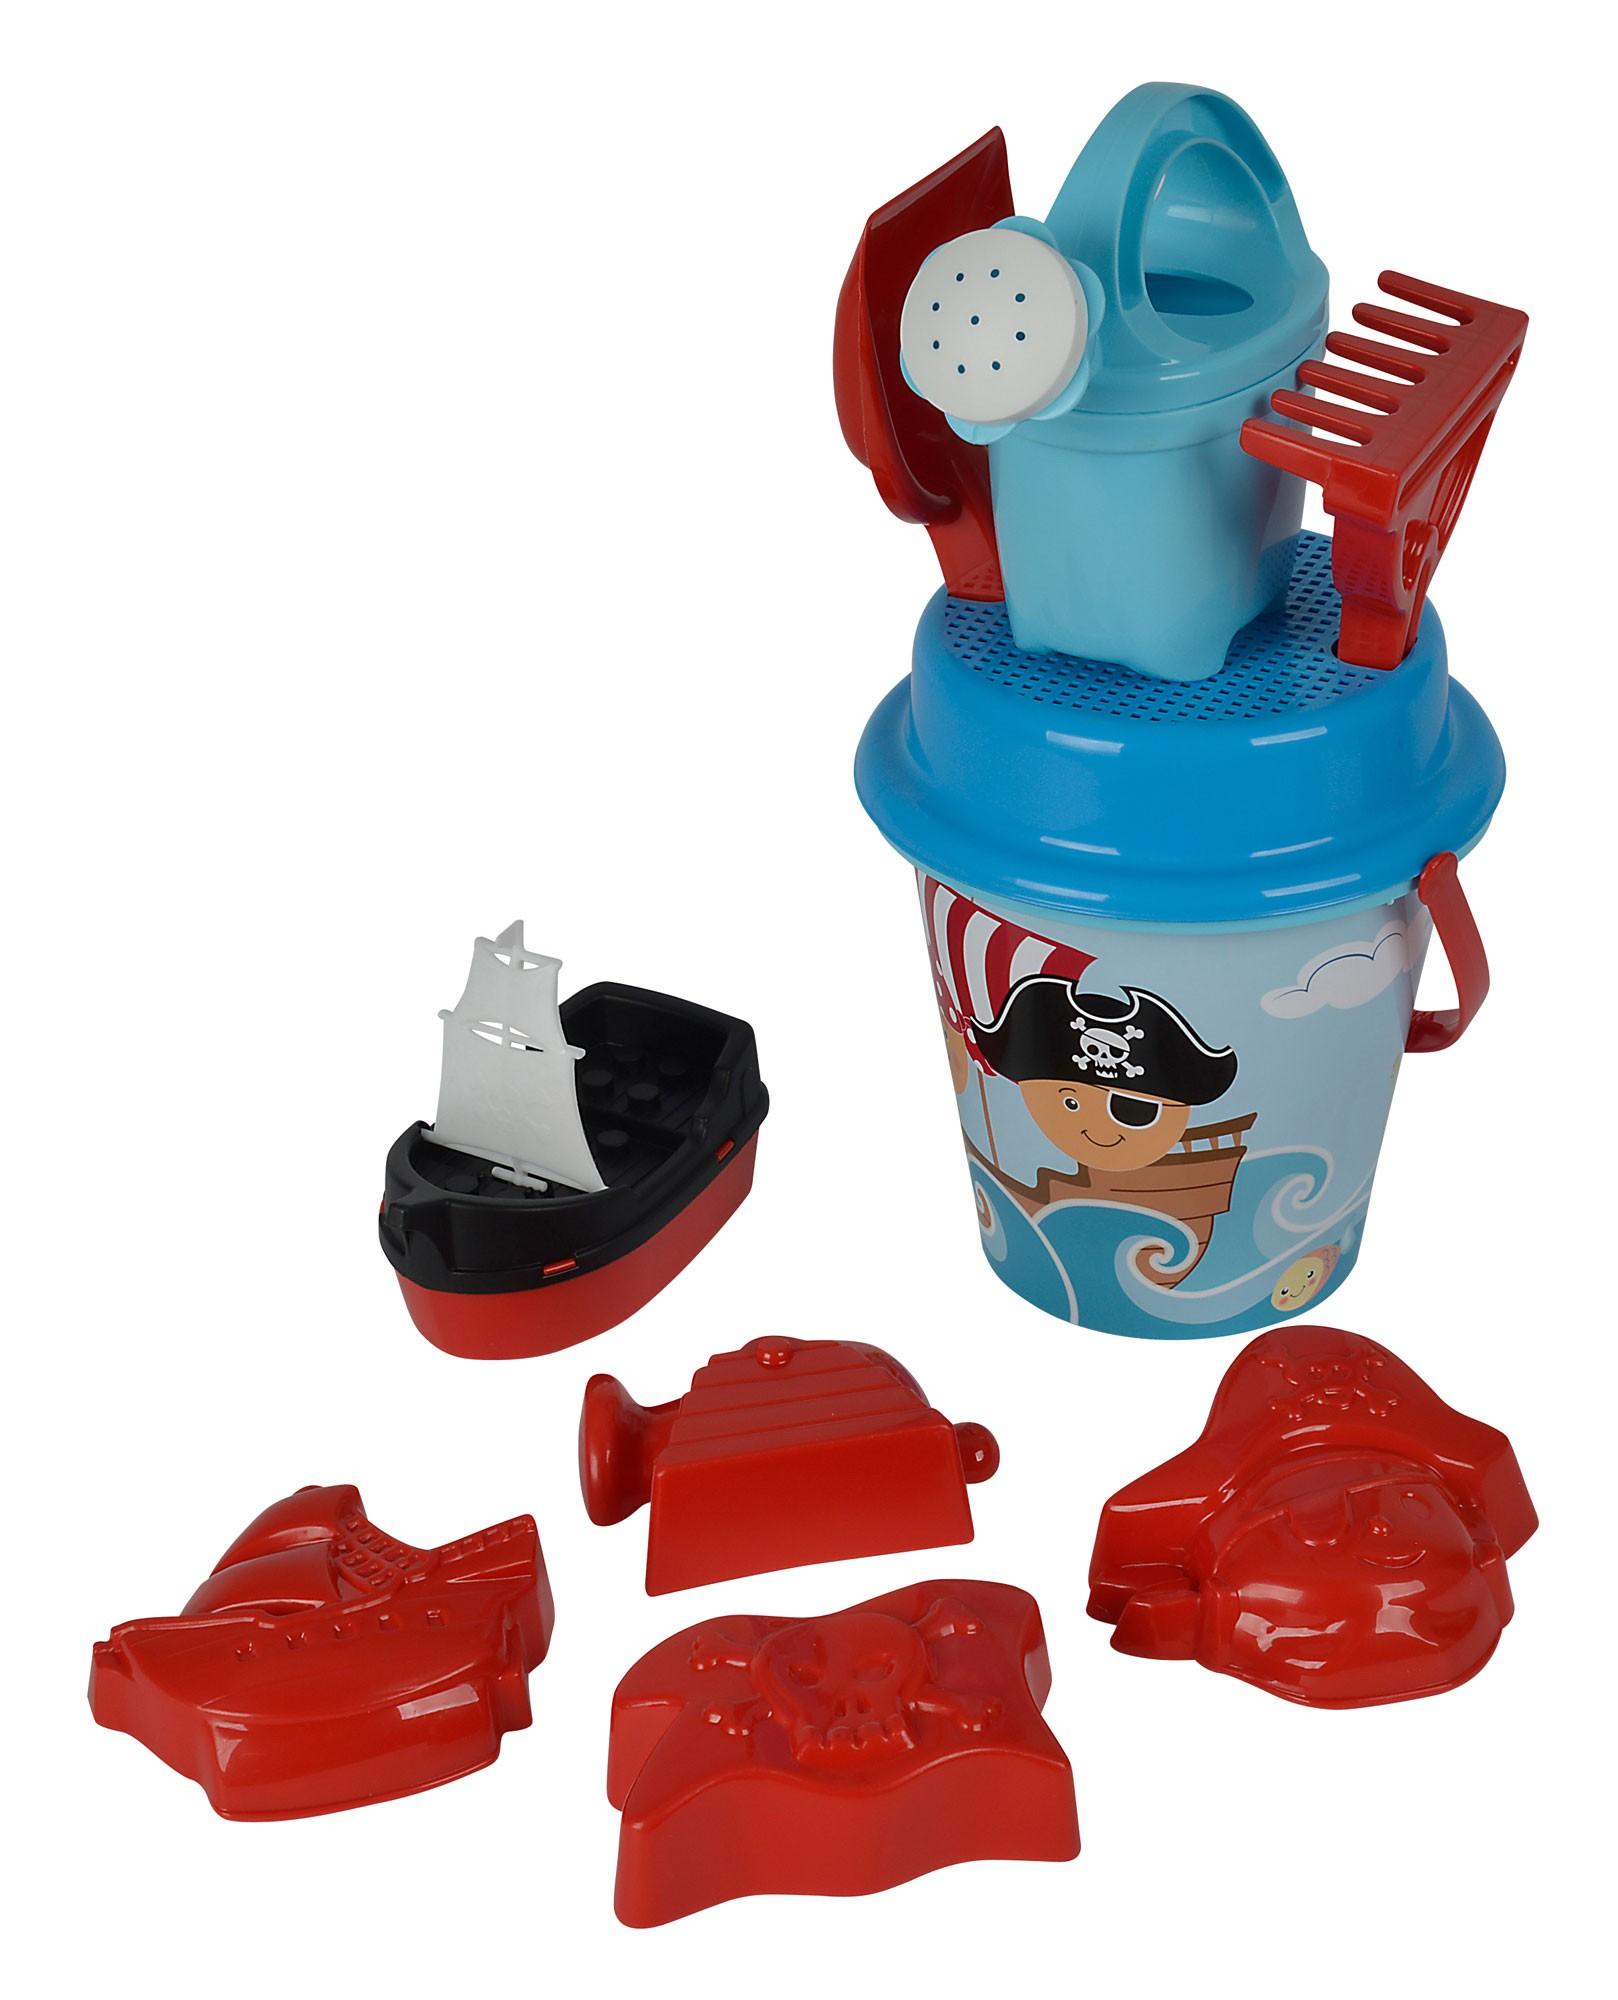 Sandspielzeug Pirat Eimergarnitur 11-teilig Simba Bild 1